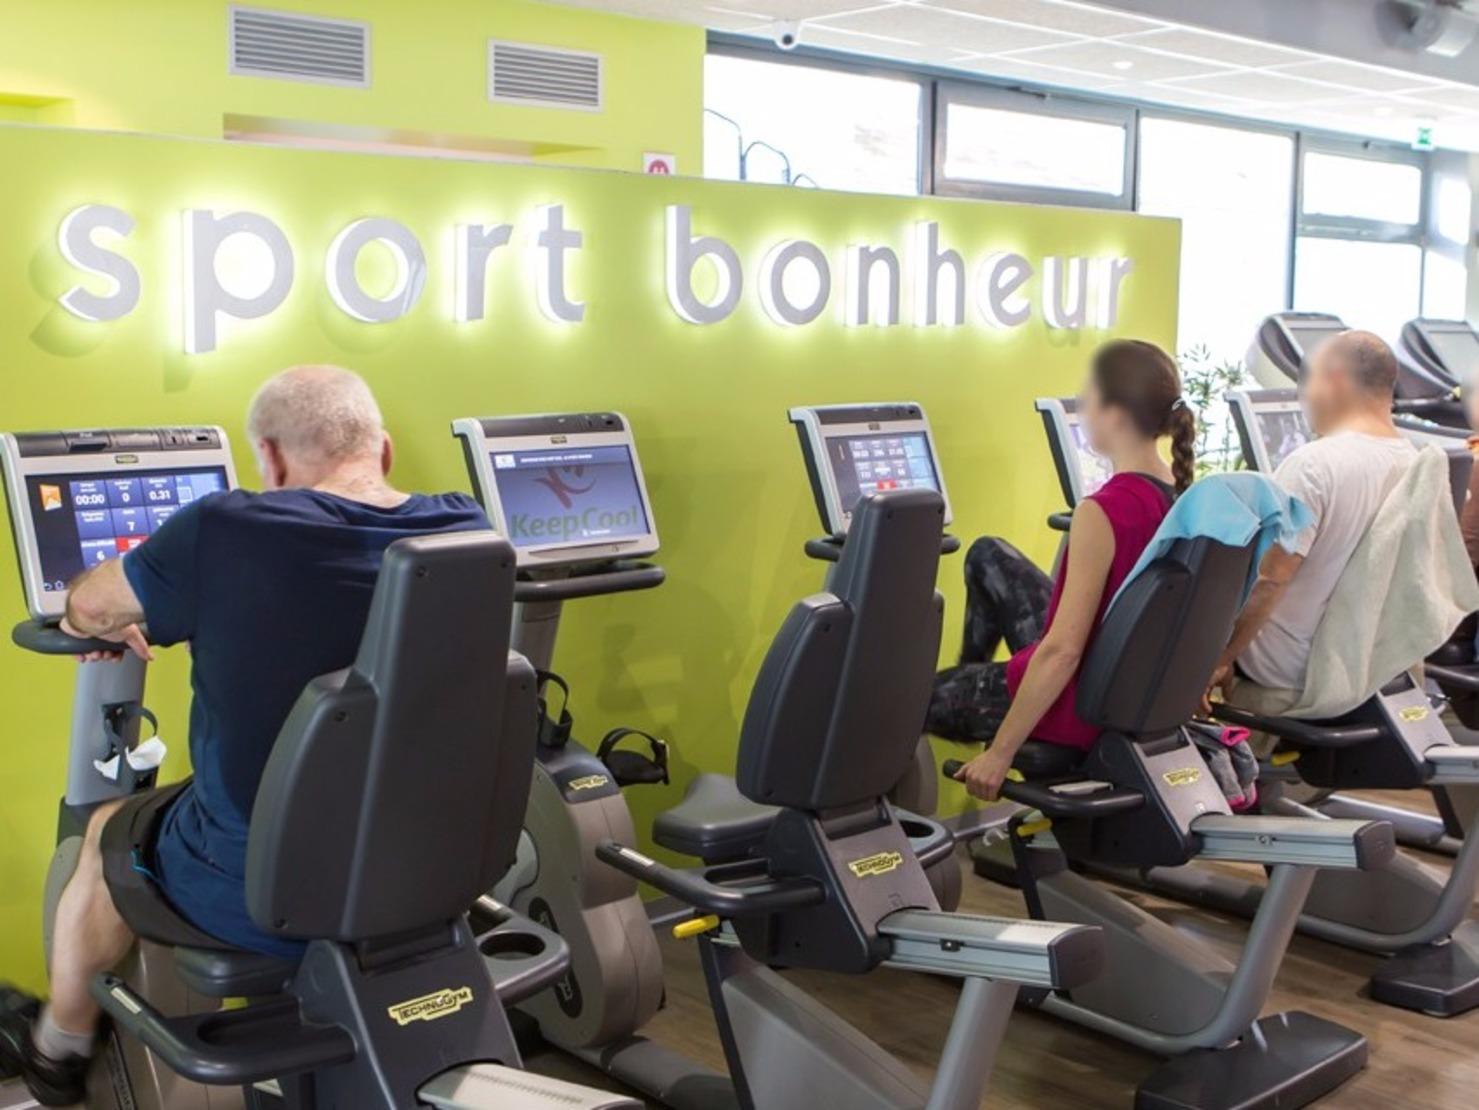 Keep Cool Aix Rotonde-0